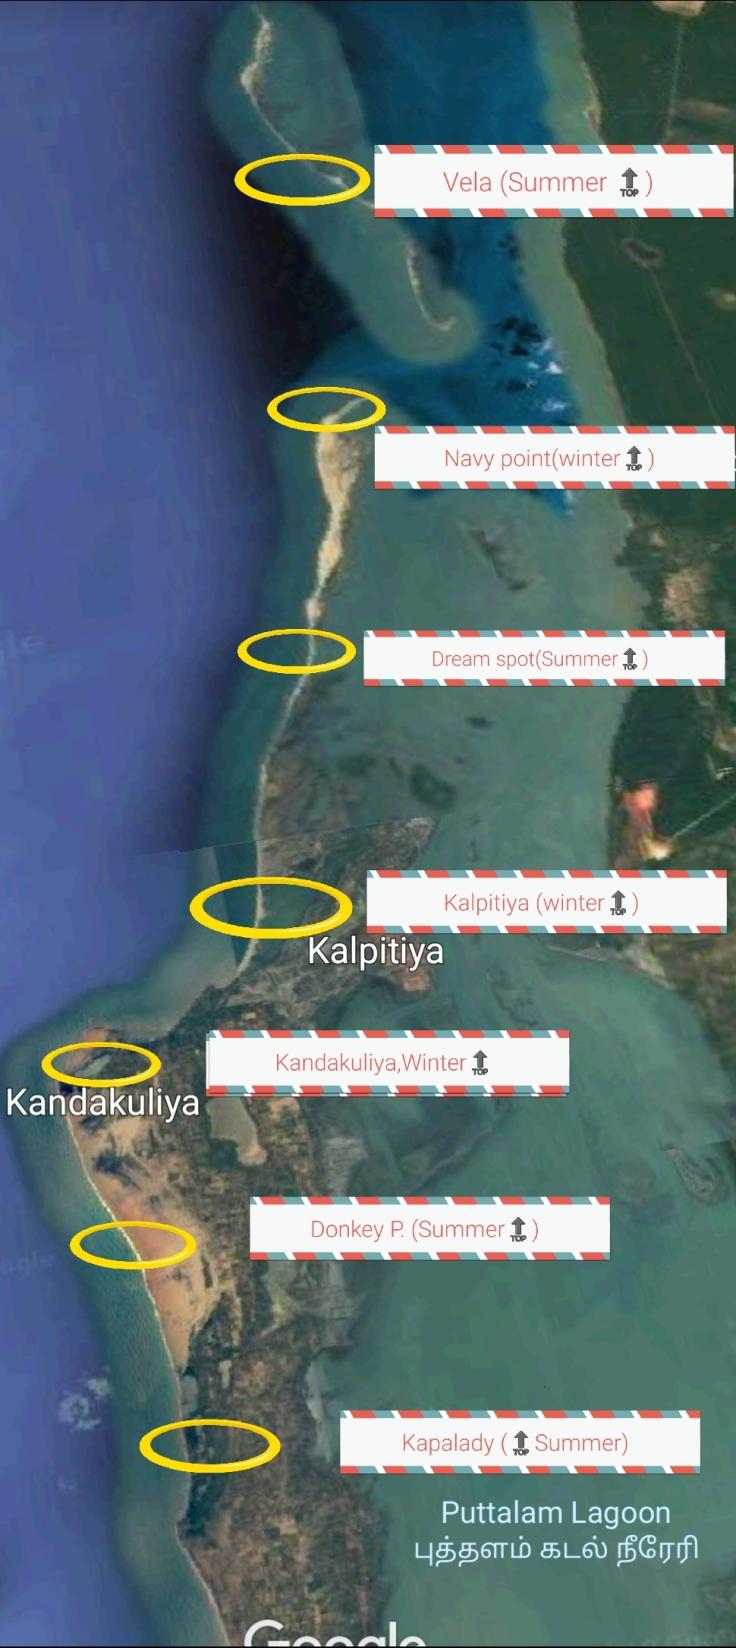 Kitesurfing spots around Kalpitiya and Kapalady